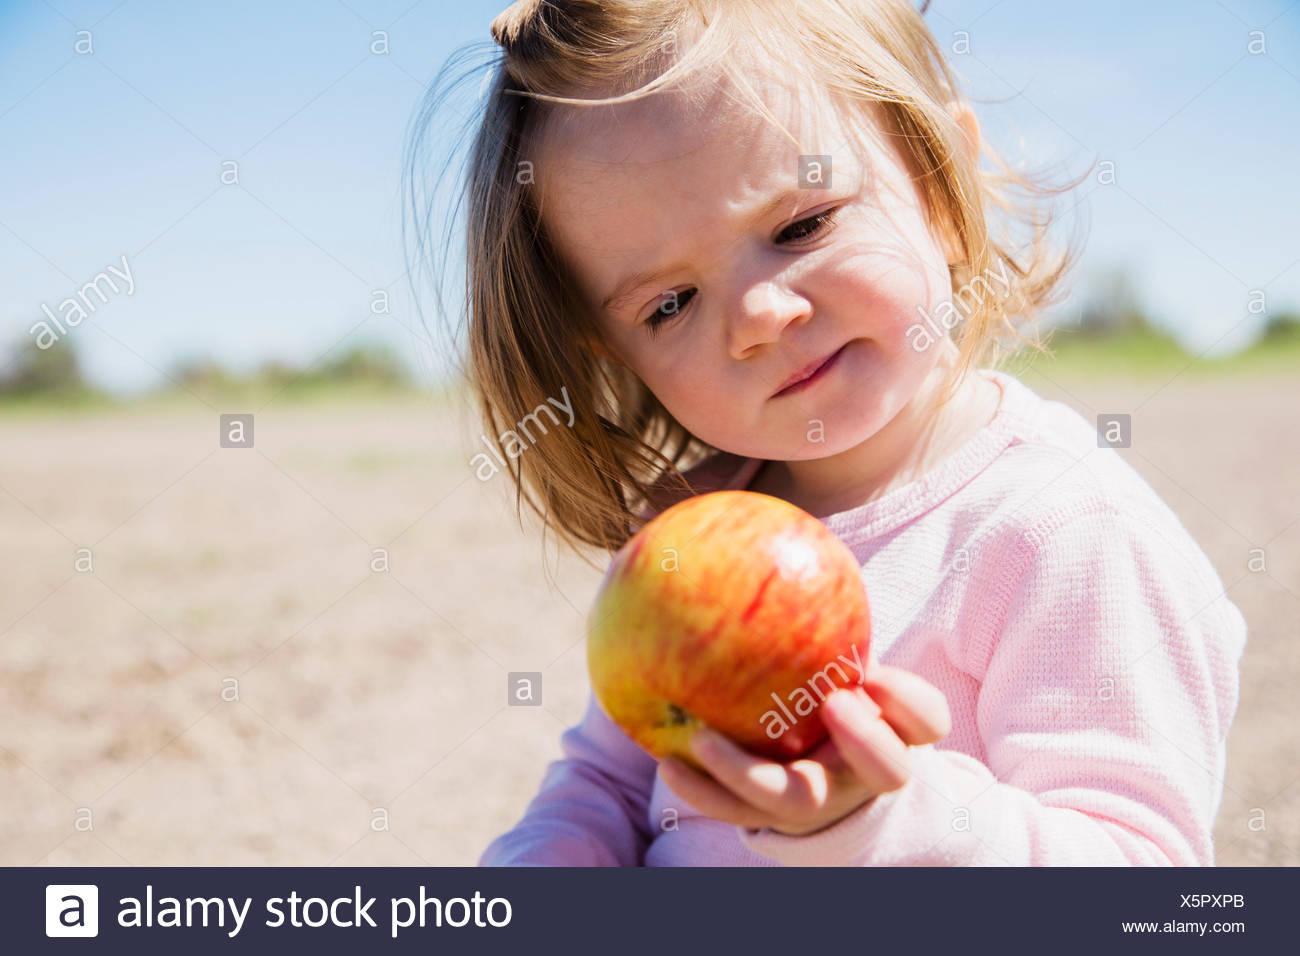 Portrait of girl (2-3) holding apple - Stock Image